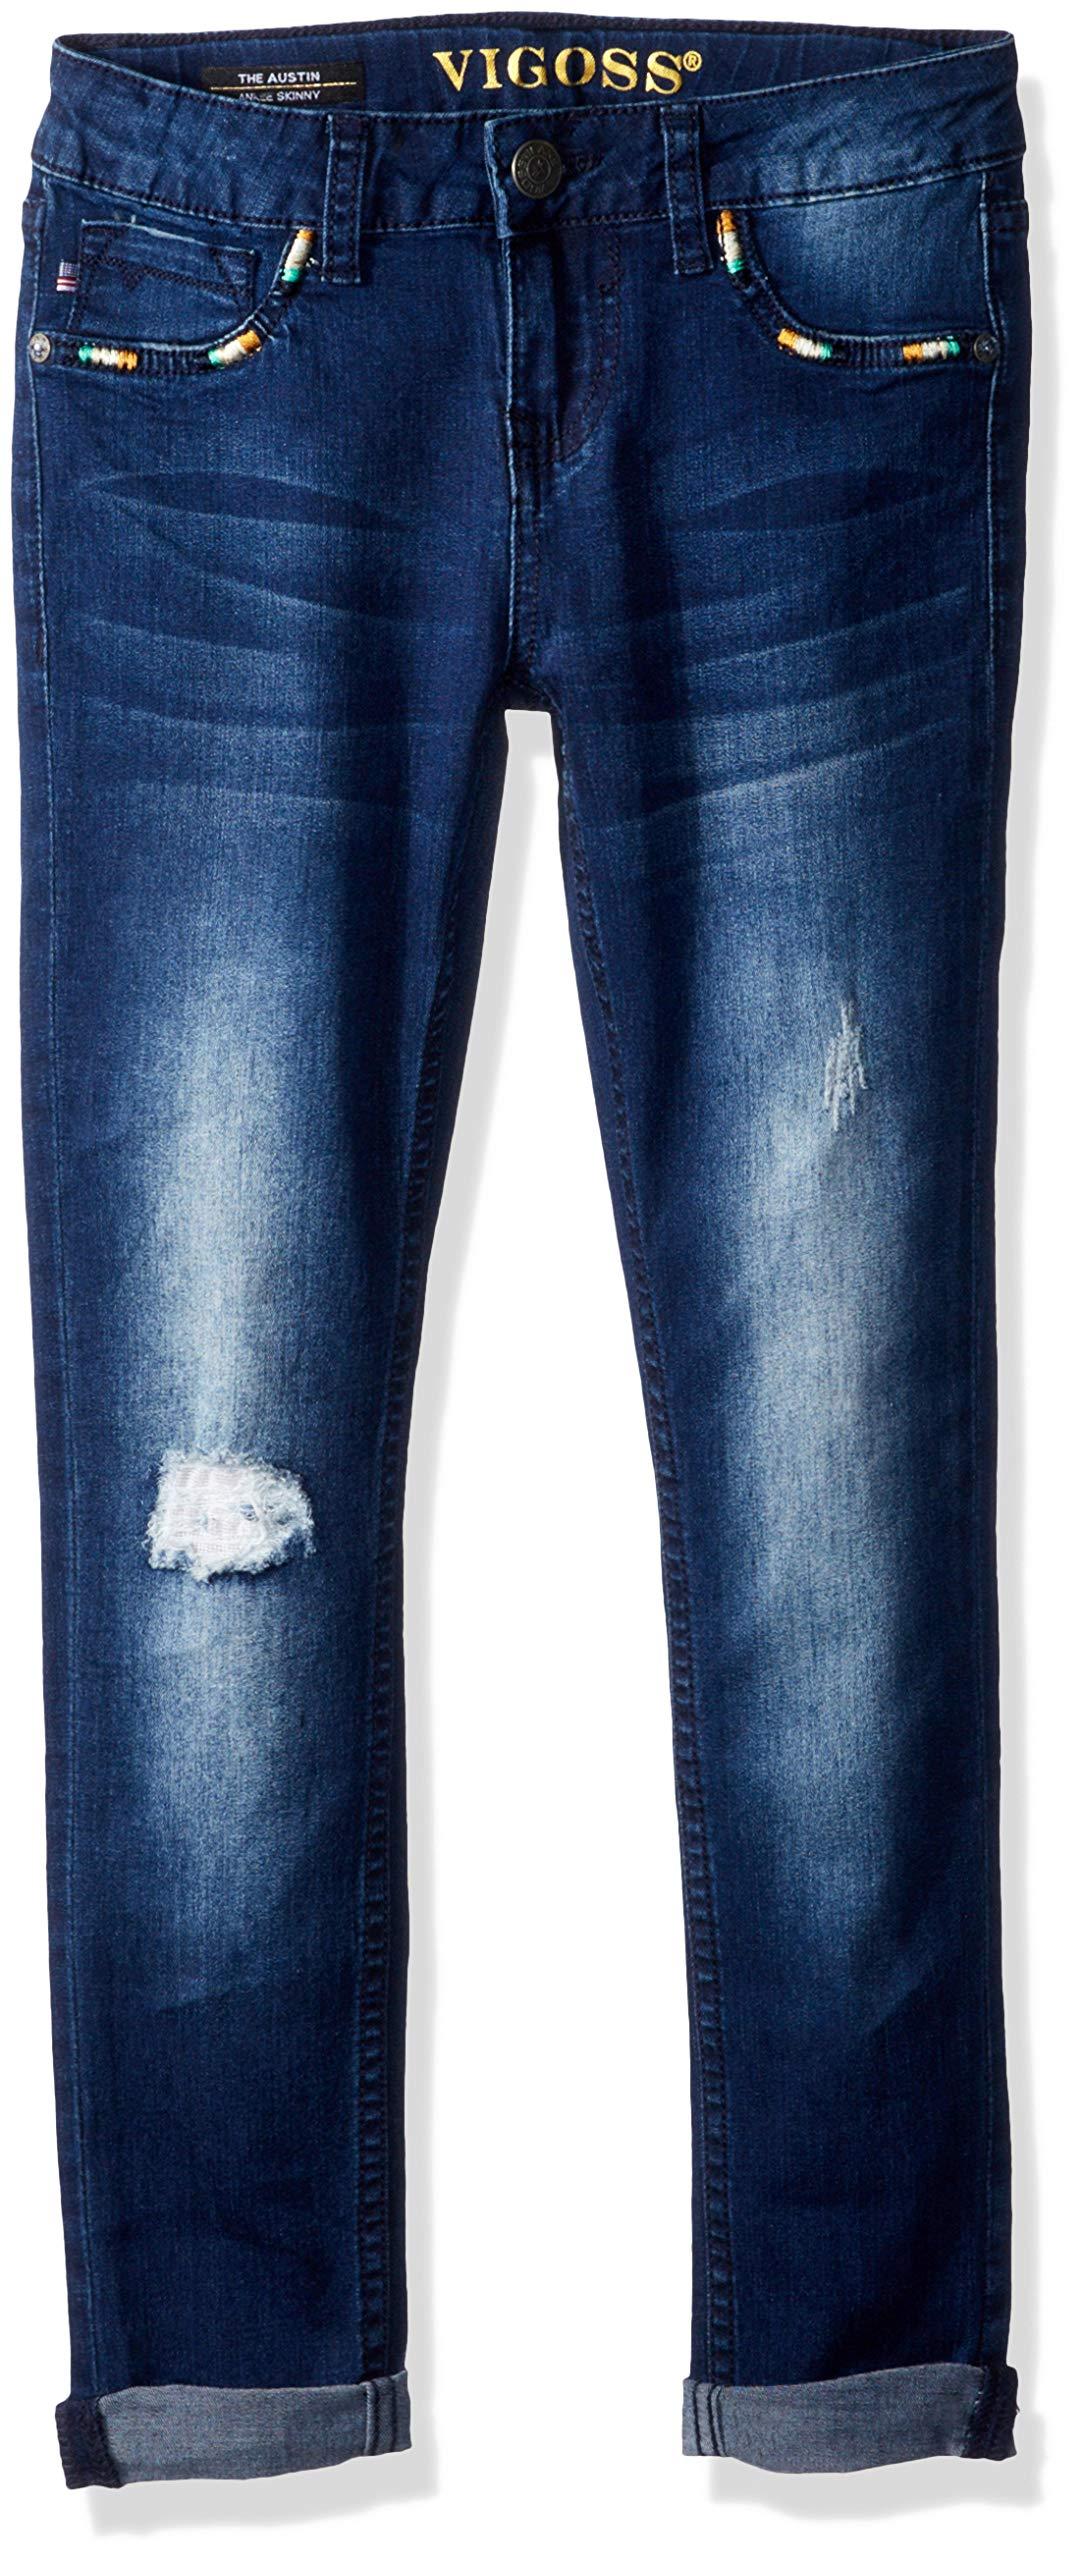 VIGOSS Girls' Big Fashion Jean, Deco Zenith, 8